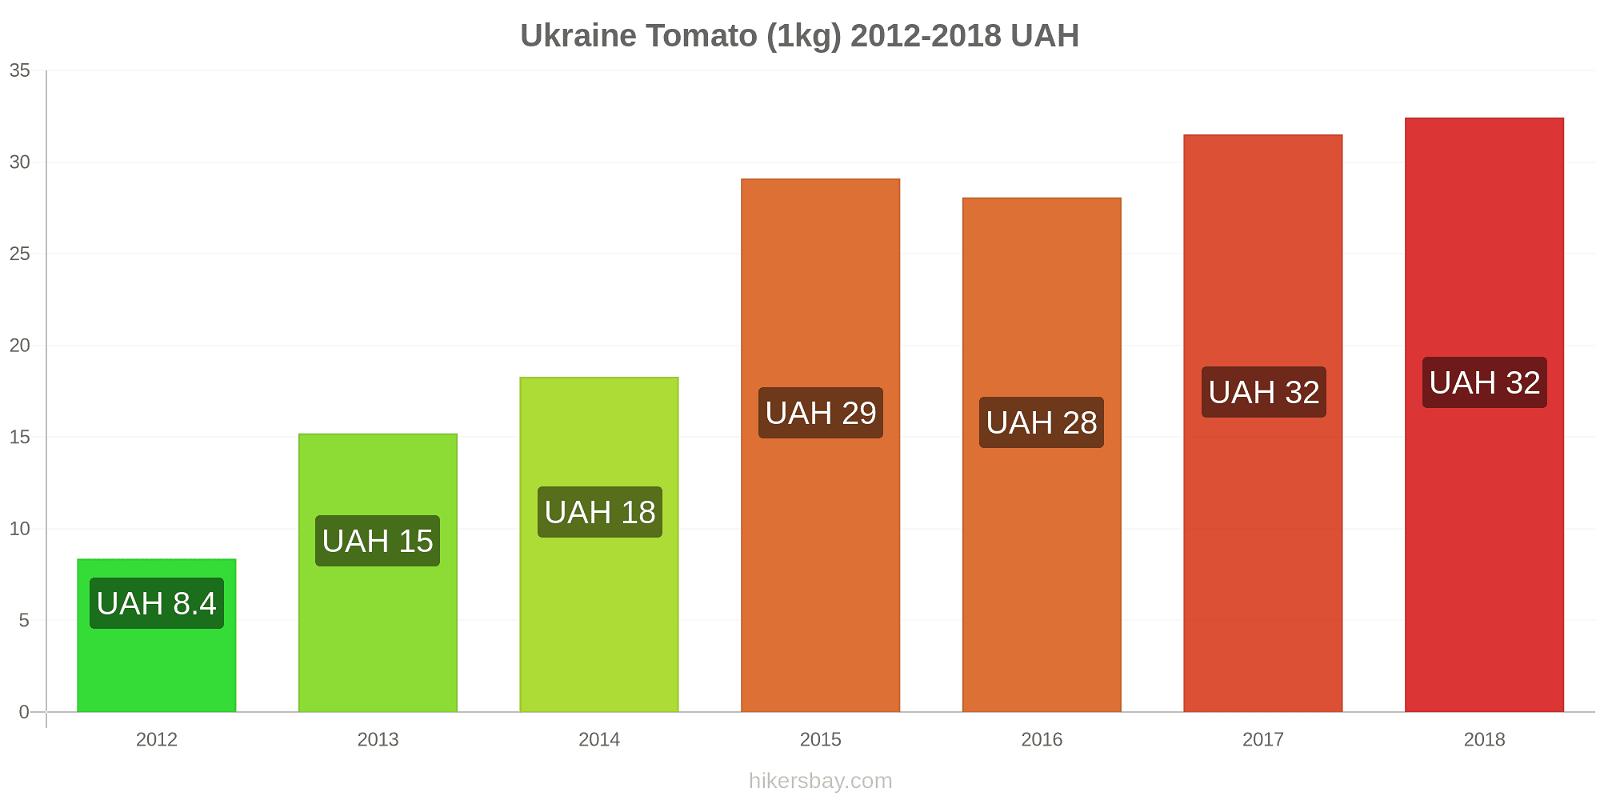 Ukraine price changes Tomato (1kg) hikersbay.com